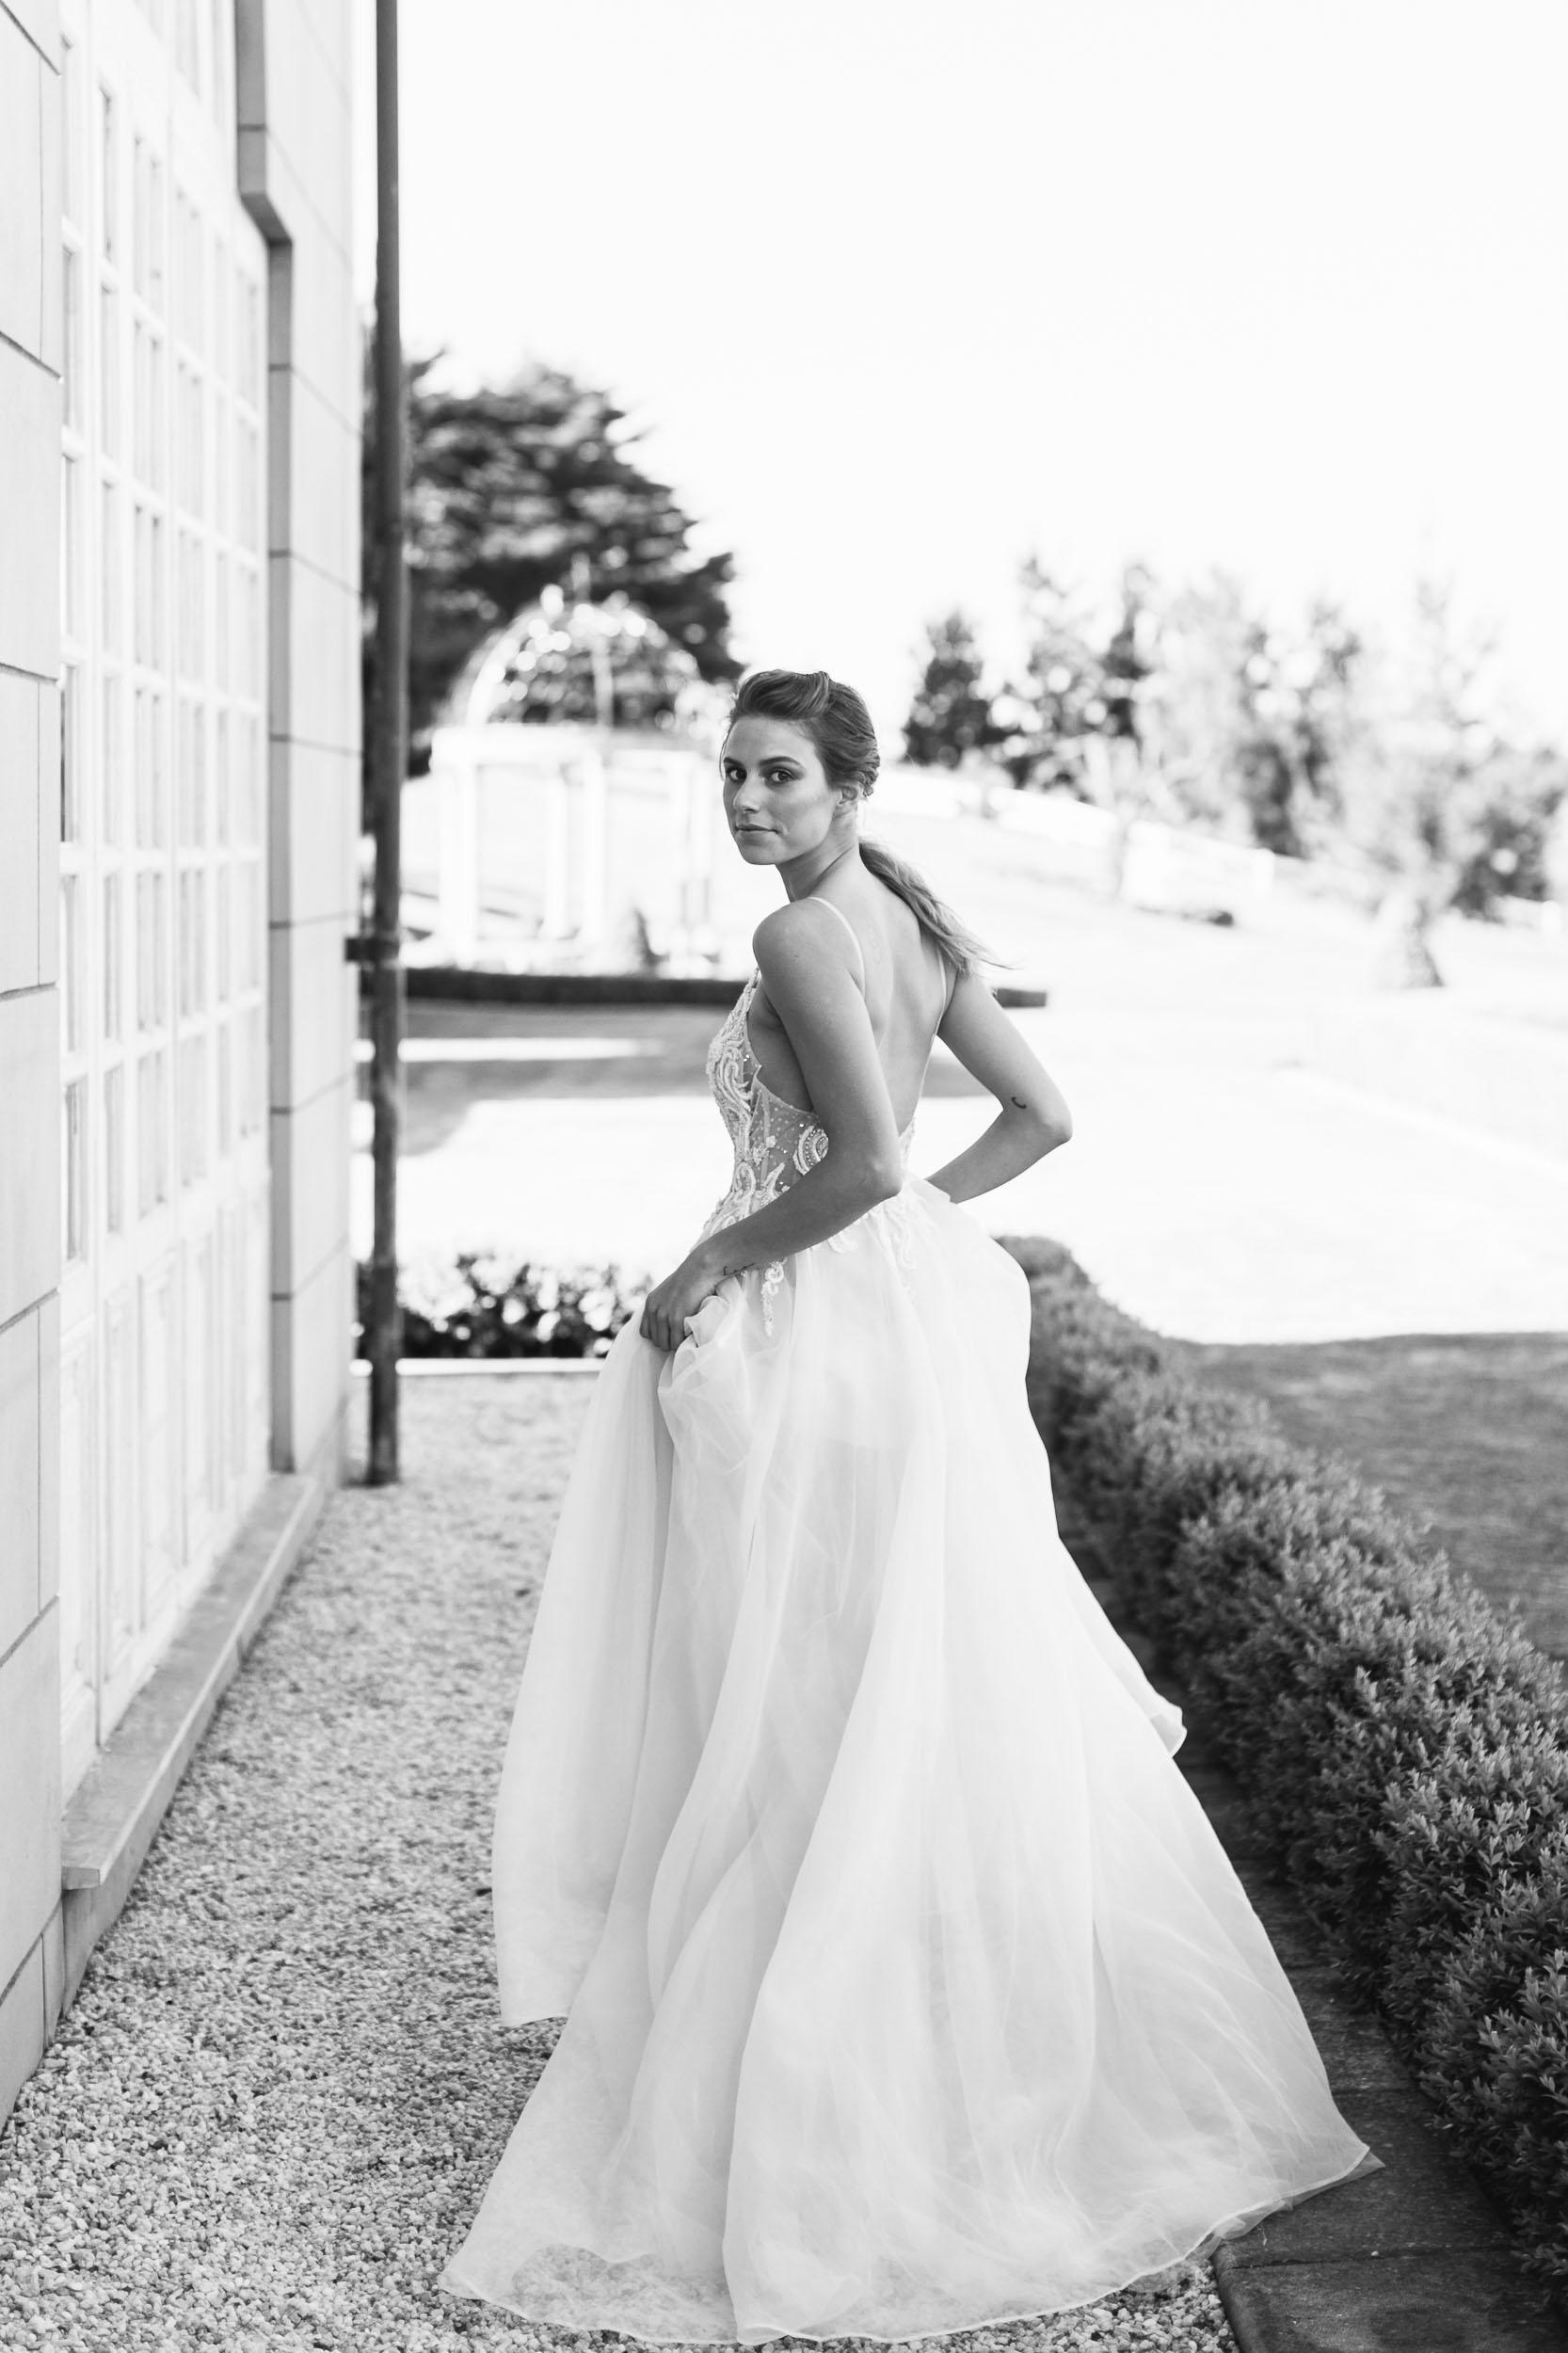 Berta Bride Back and White Wedding Photo | Wedding Photography by Kas Richards